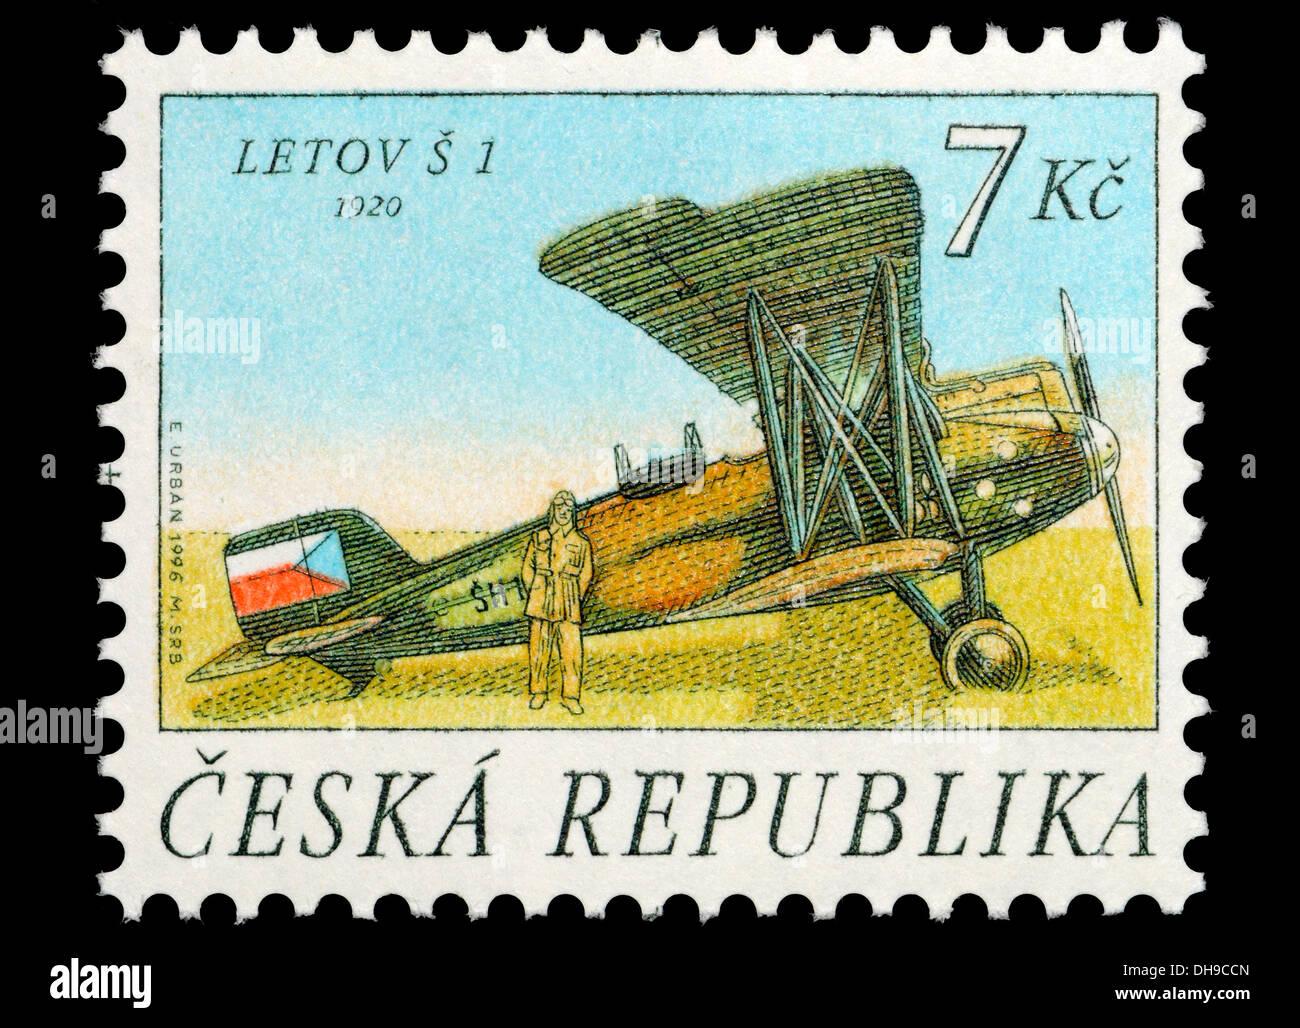 Czech Republic postage stamp: Letov S-1 (1920) Czechoslovak single-engined two-seat biplane surveillance aircraft - Stock Image